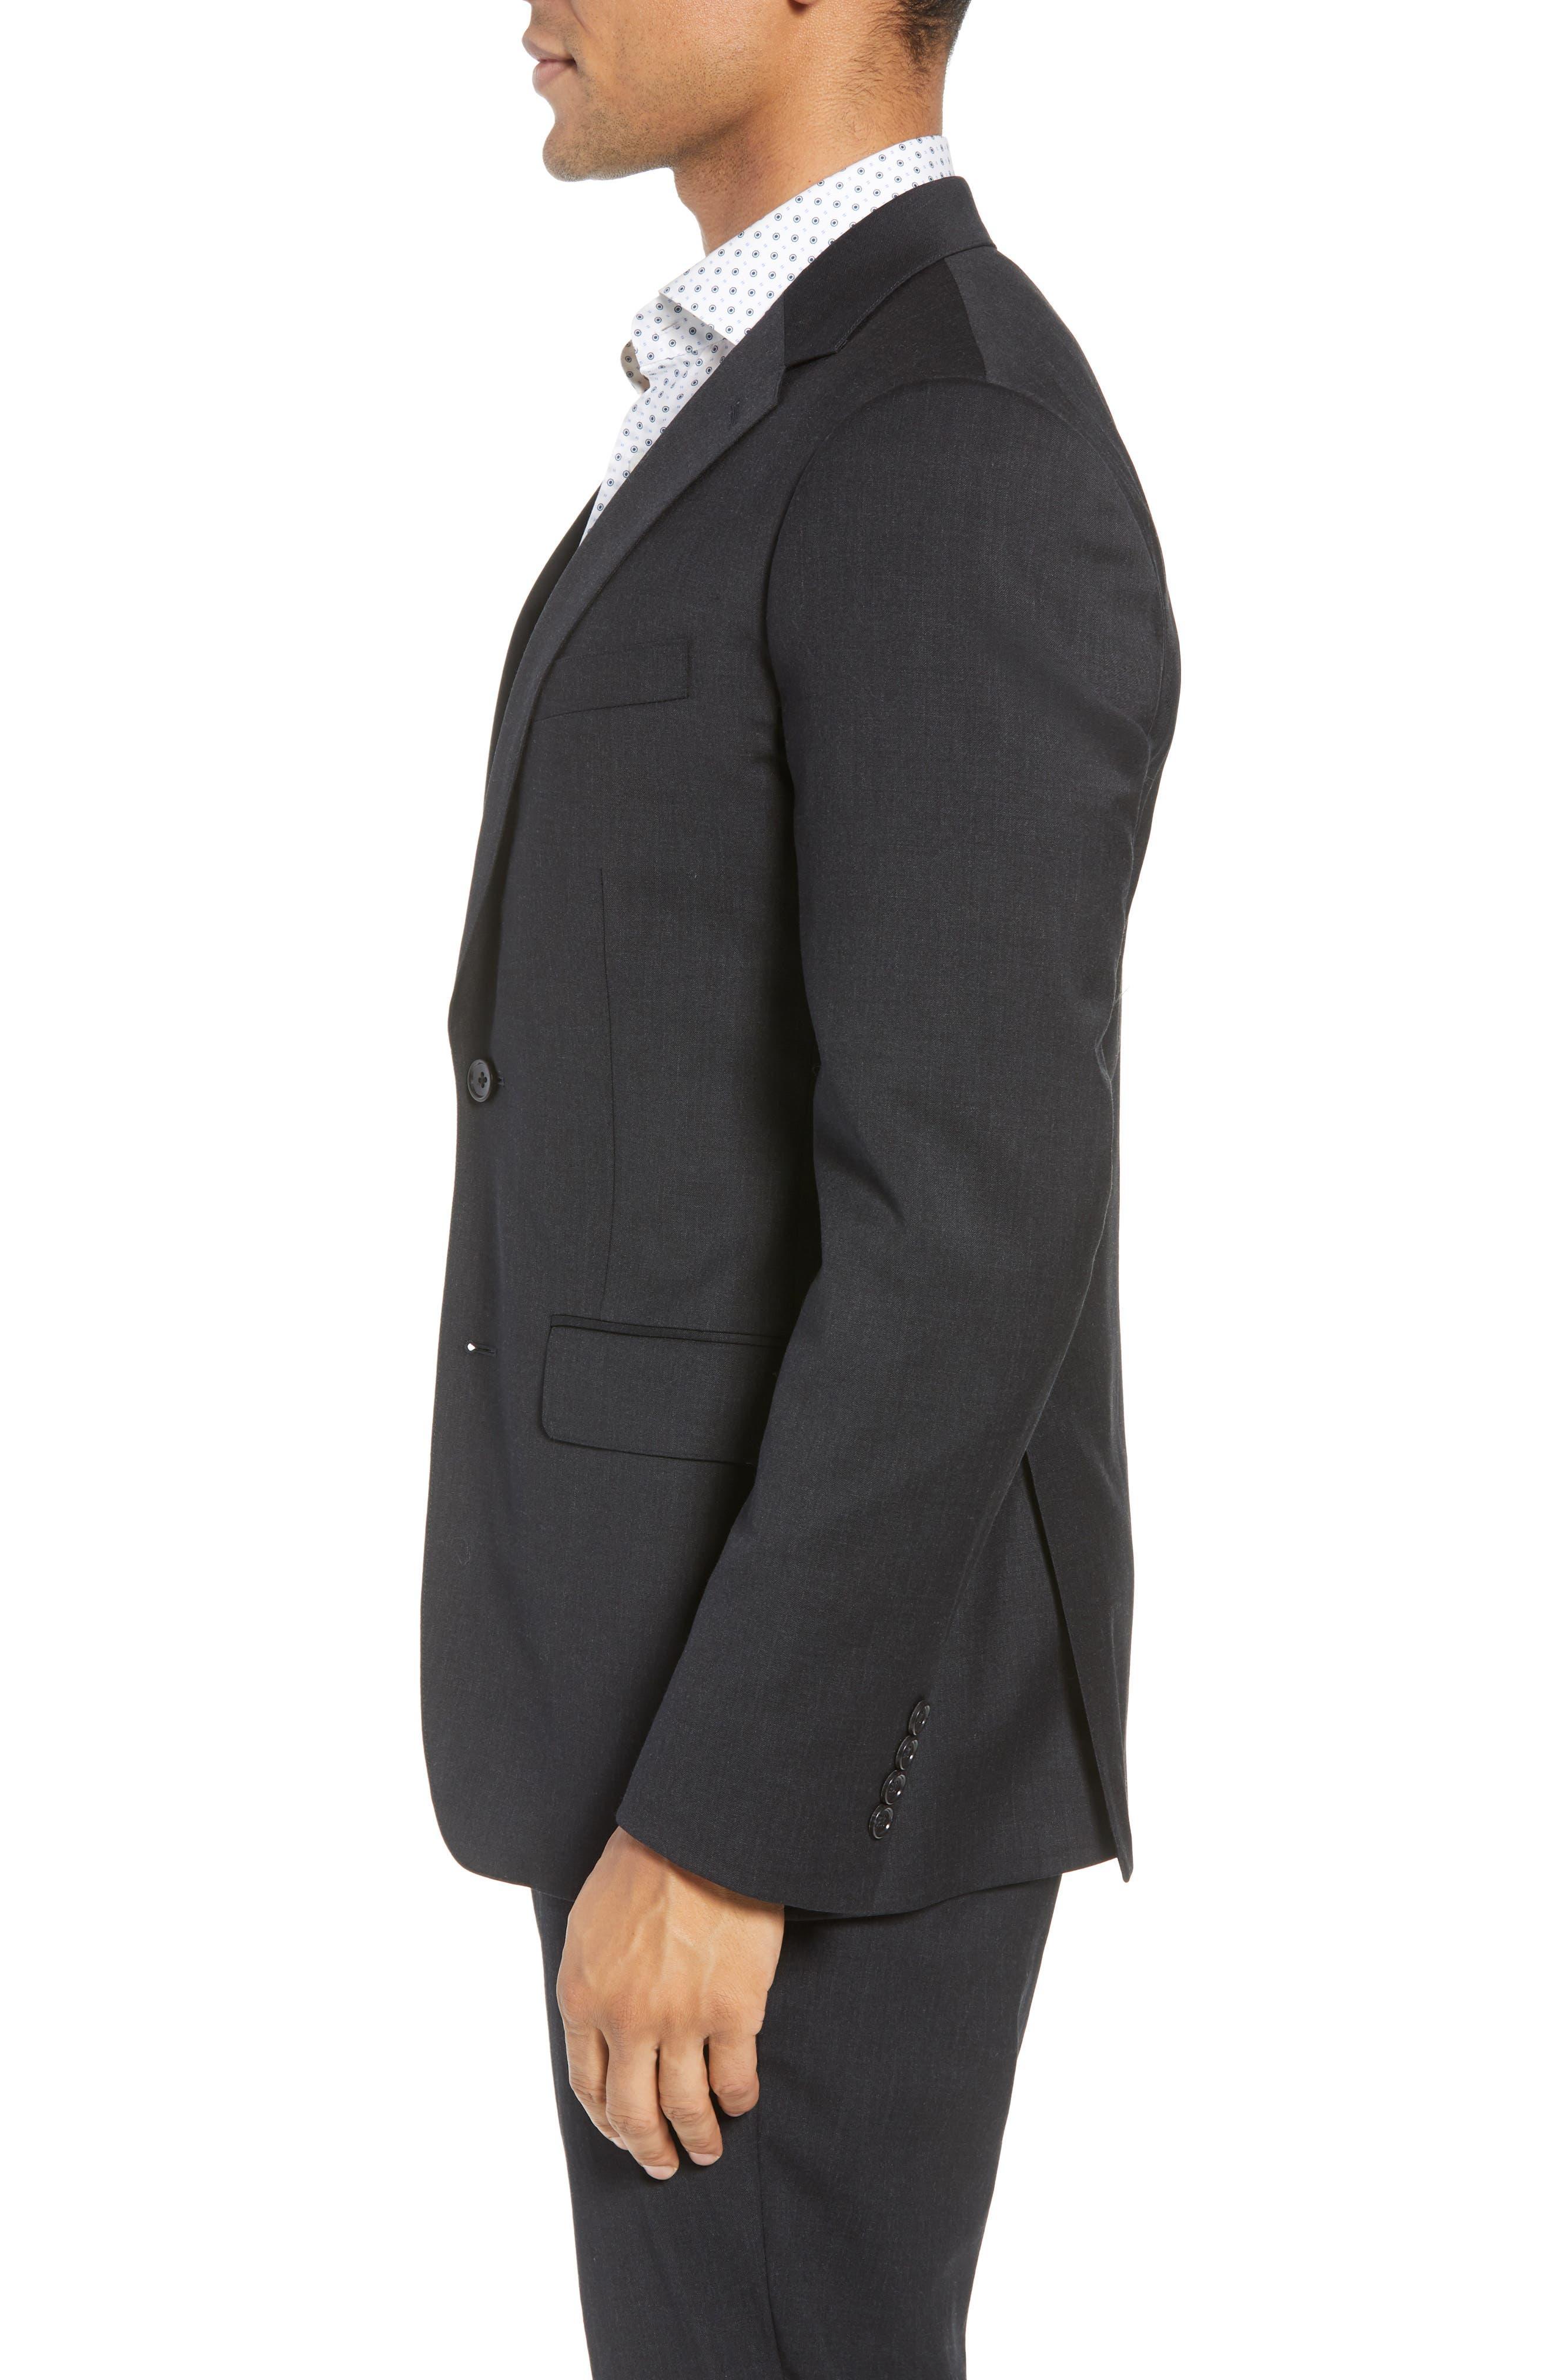 BONOBOS, Jetsetter Slim Fit Stretch Wool Blazer, Alternate thumbnail 4, color, CHARCOAL